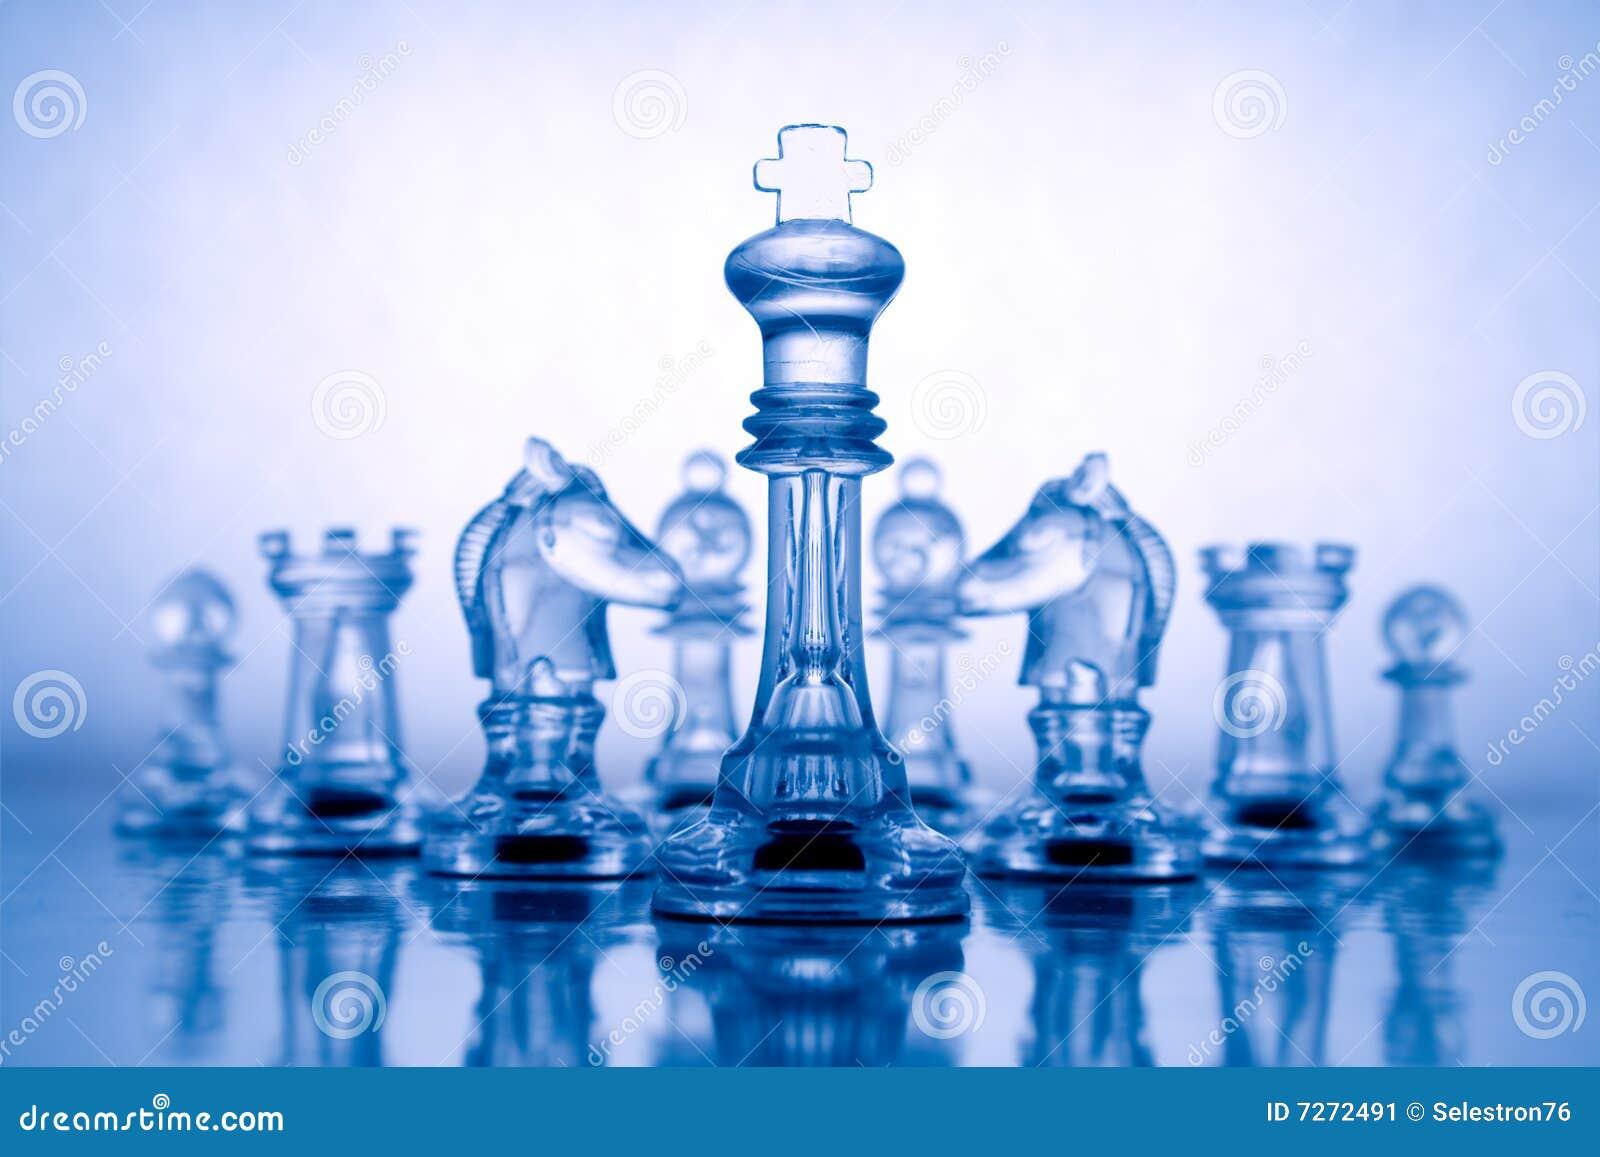 Transparent blue chess